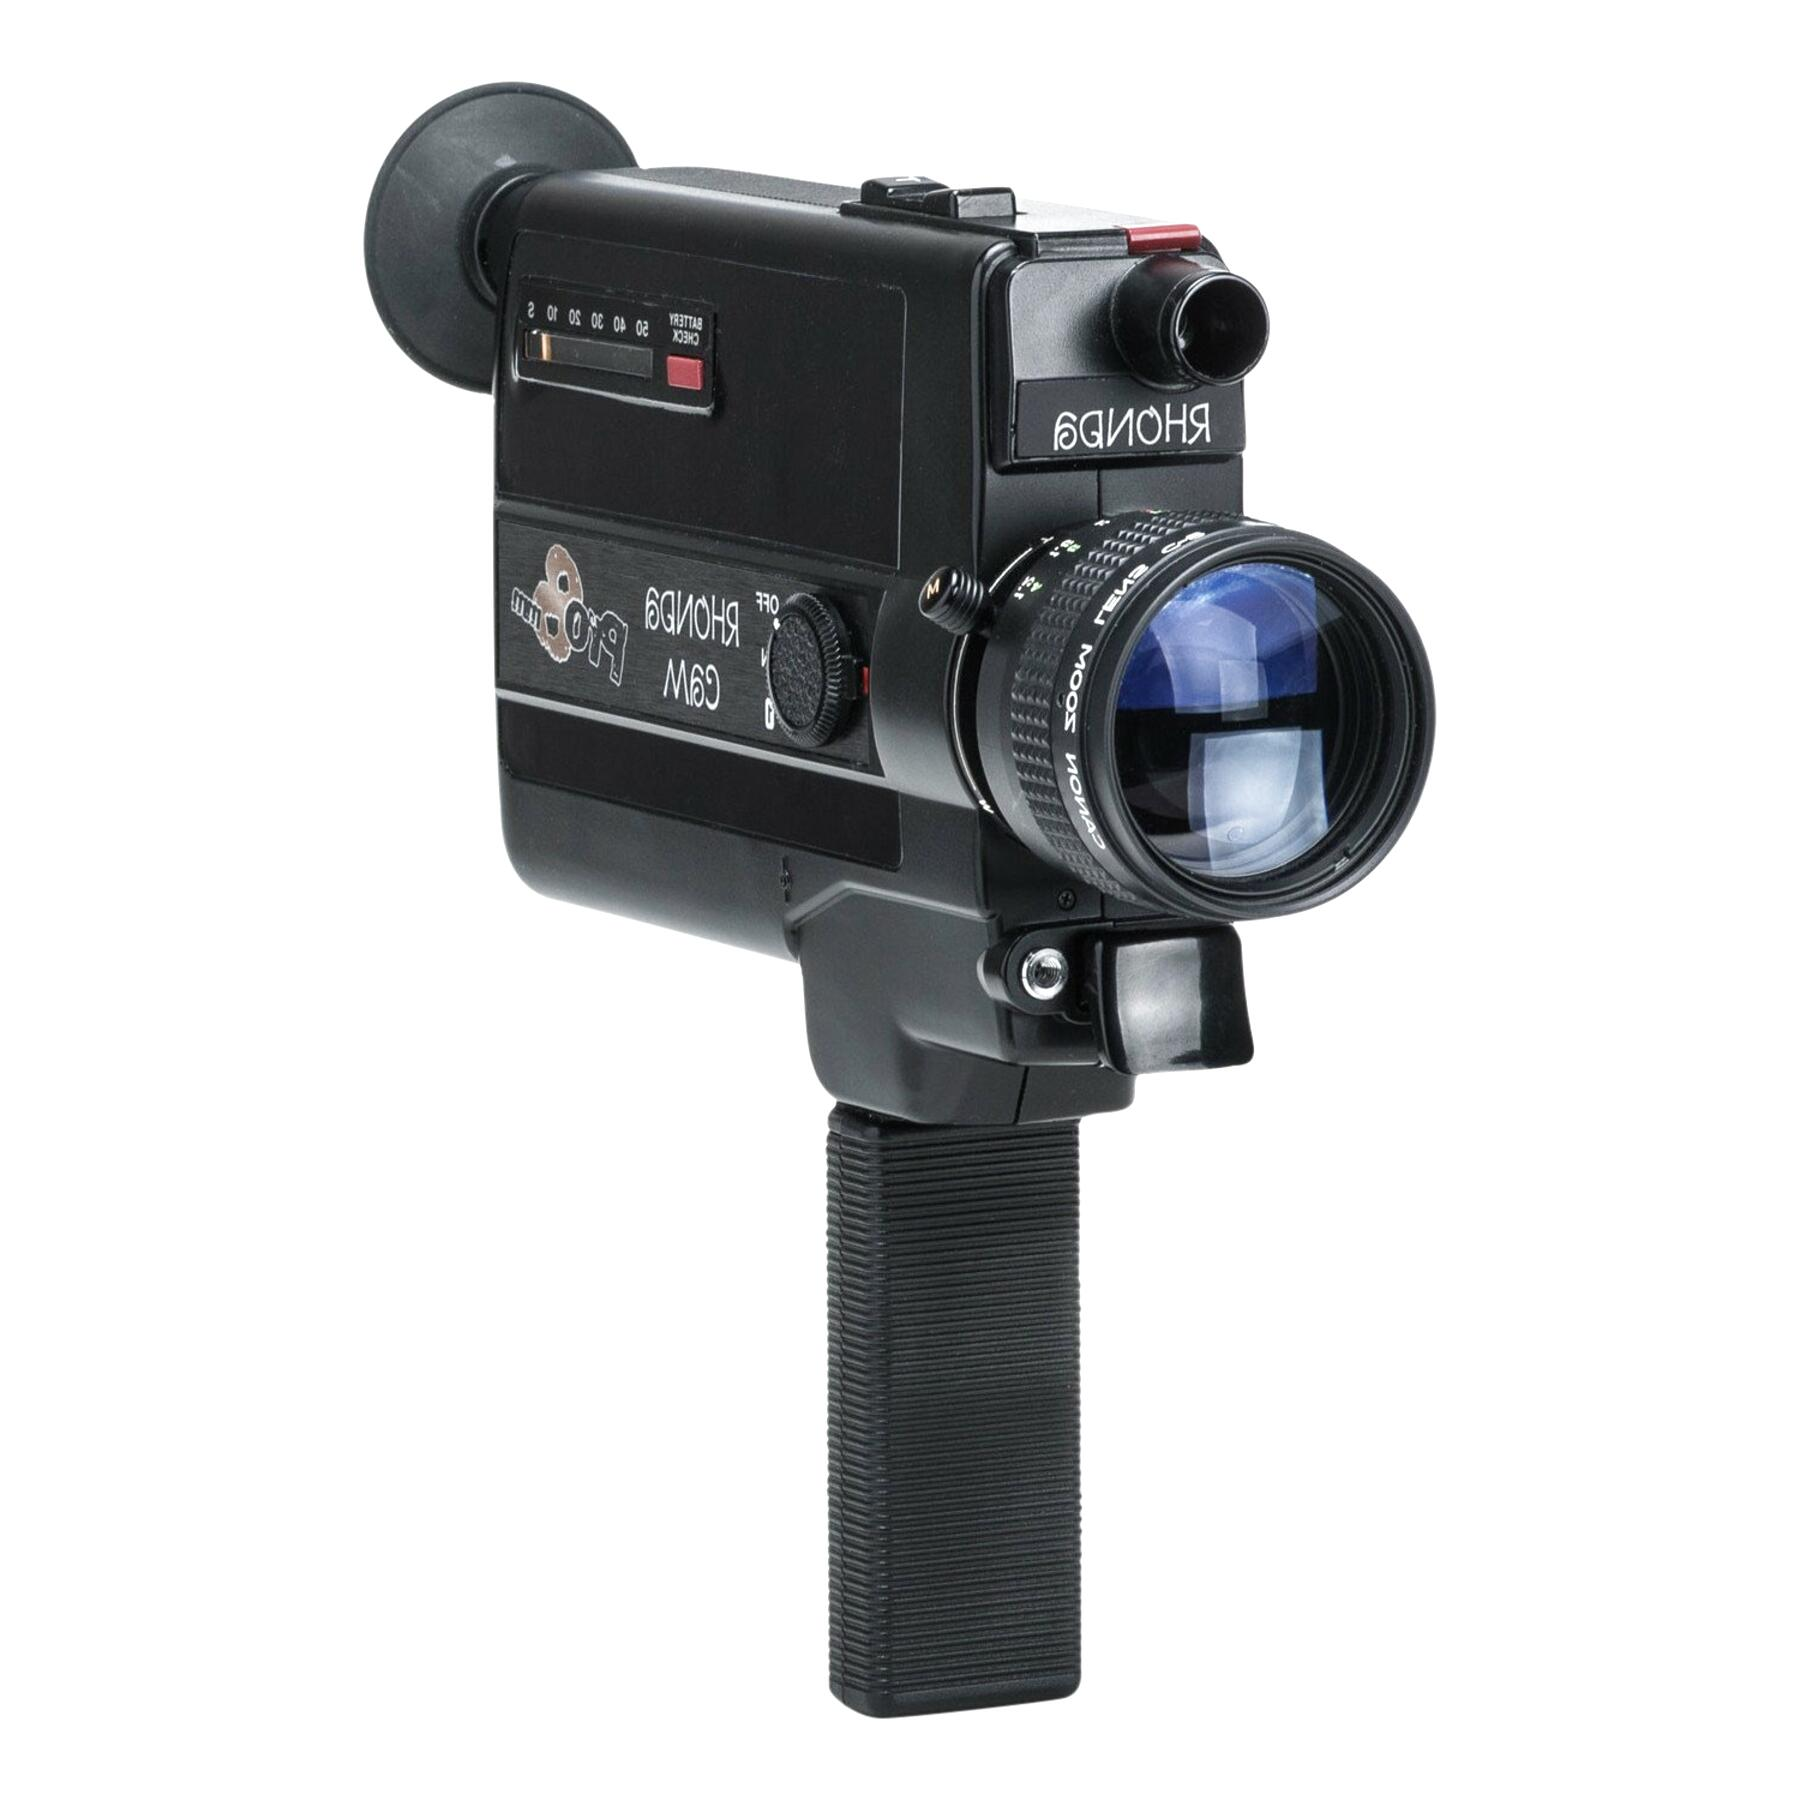 super 8 film camera for sale